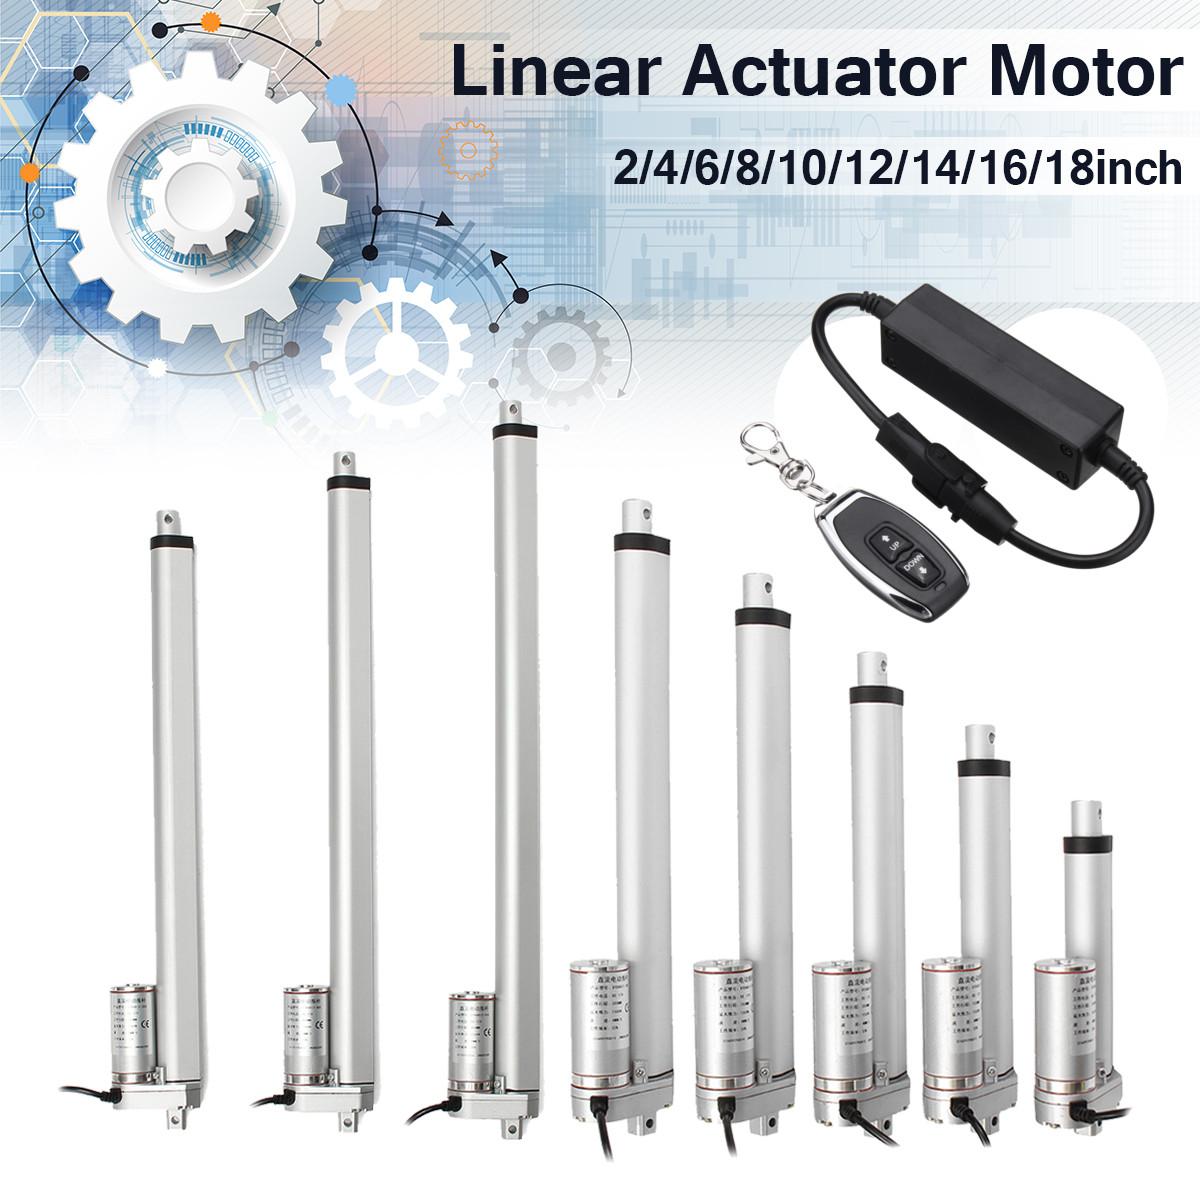 1500N 12V 4/6/8/10/12/14/16/18 inch Linear Actuator Adjustable Actuator Tor Opener Linear Actuator Motor